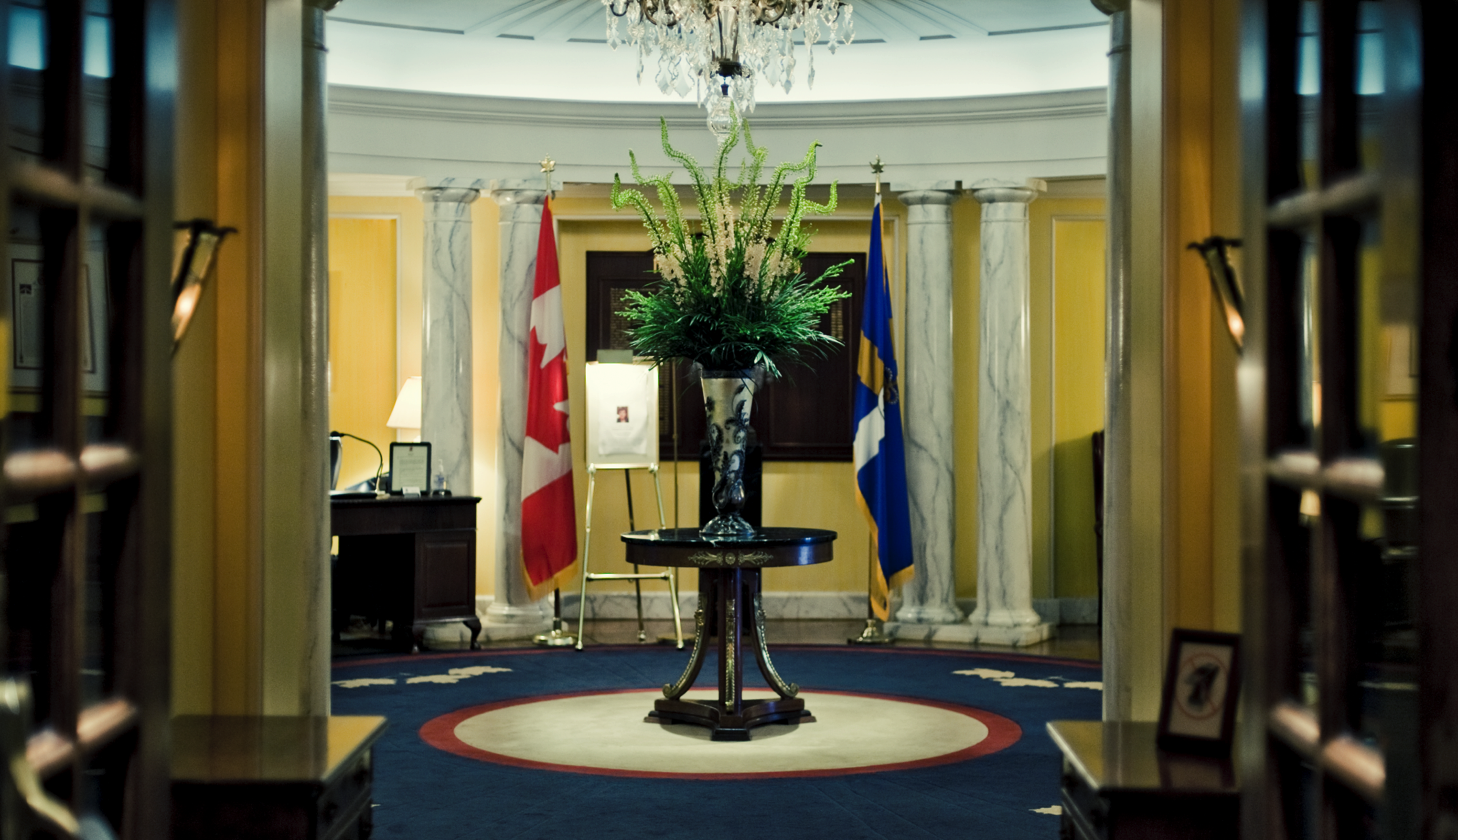 Création De Rideaux Originaux history – rideau club ottawa